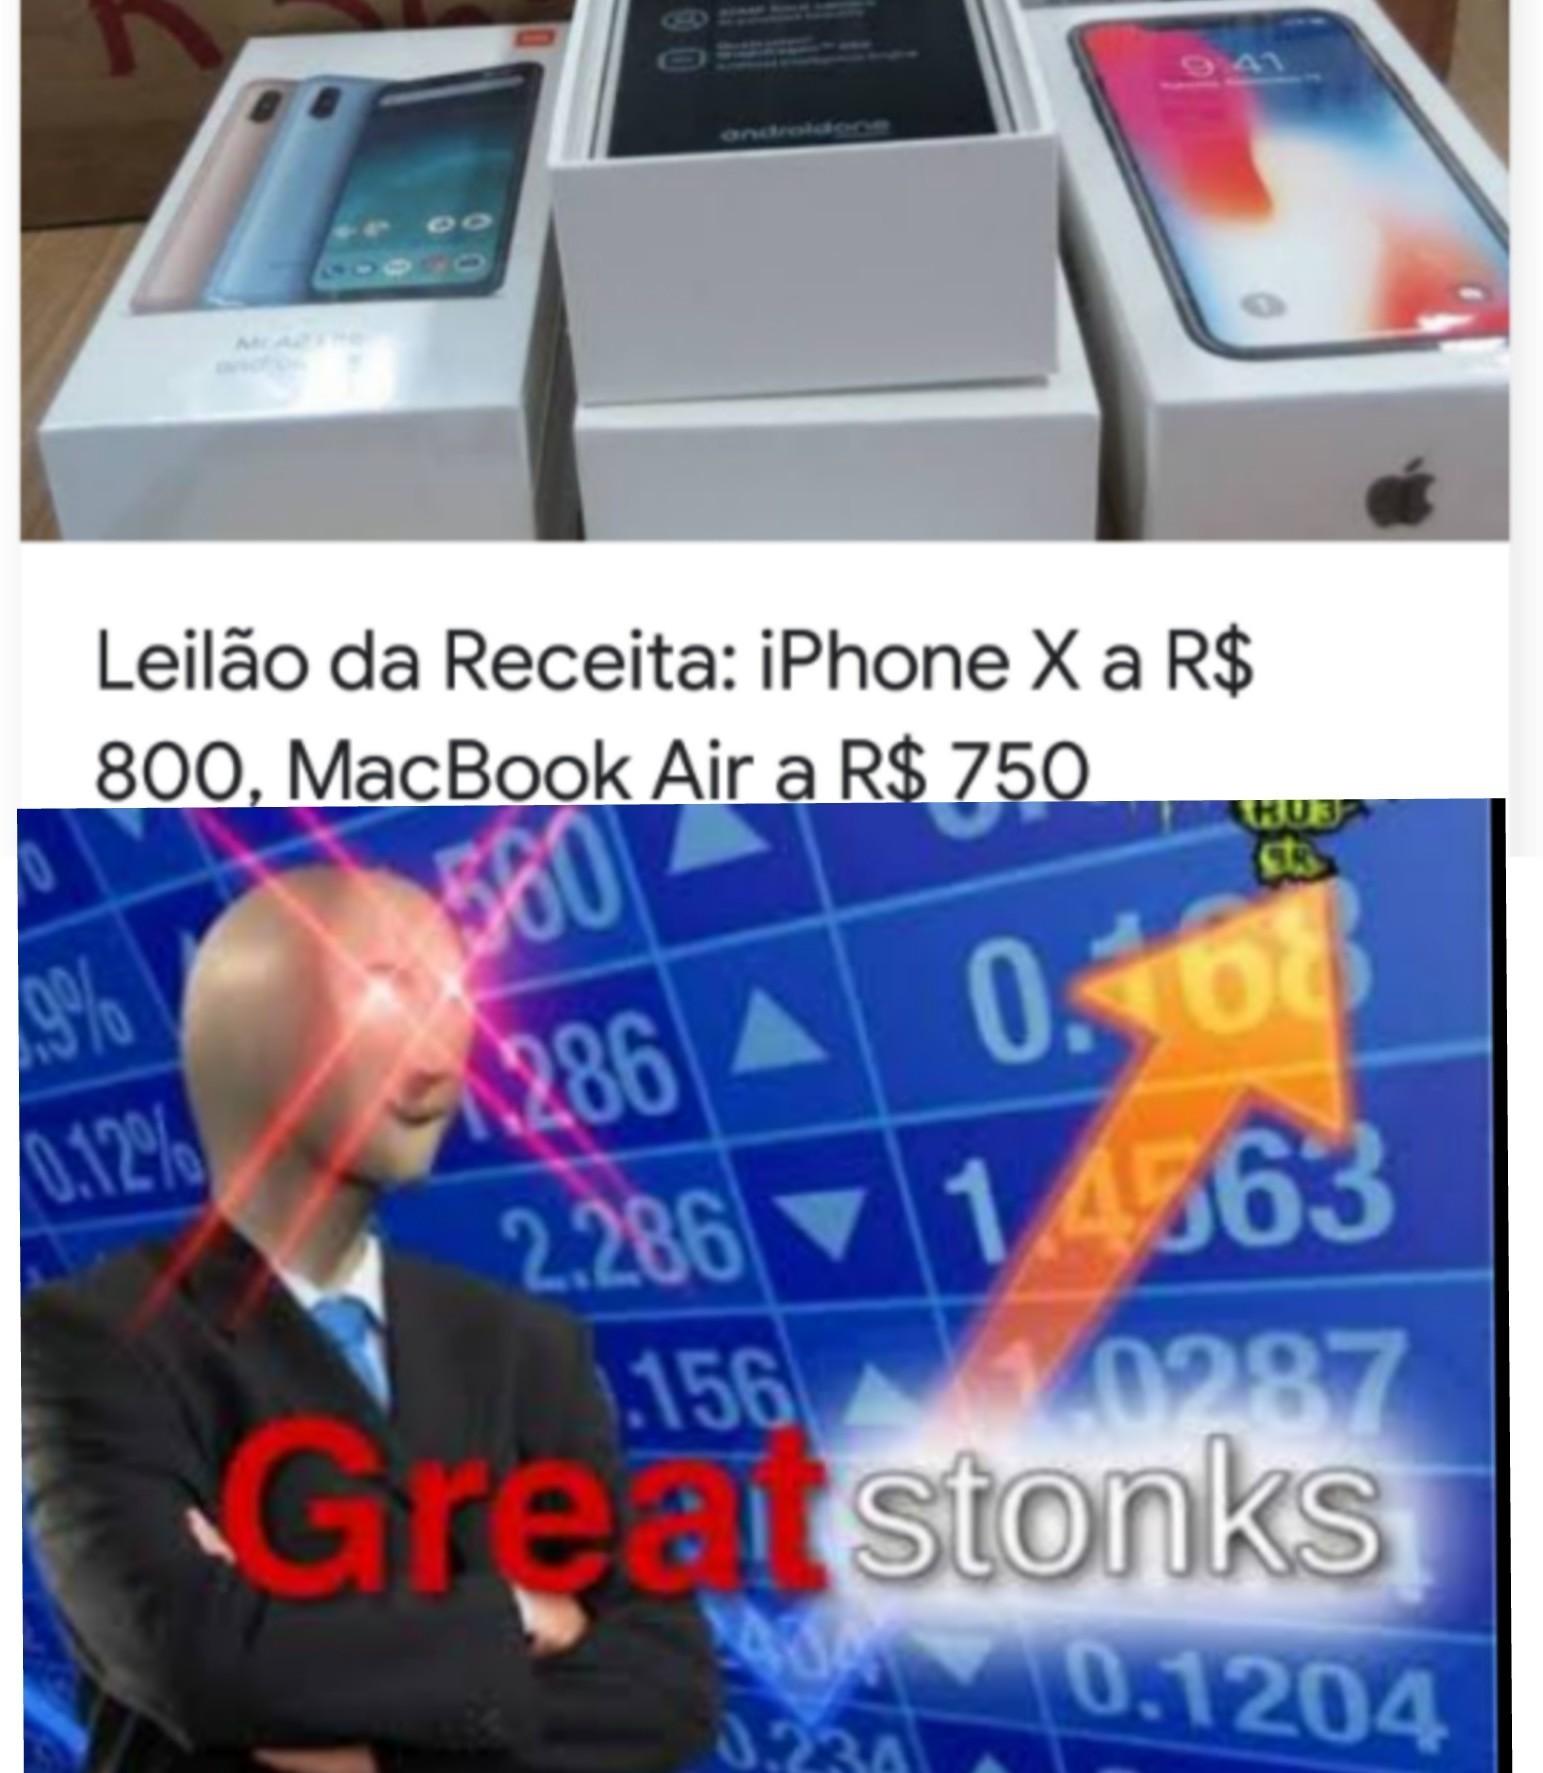 Geat stonks - meme